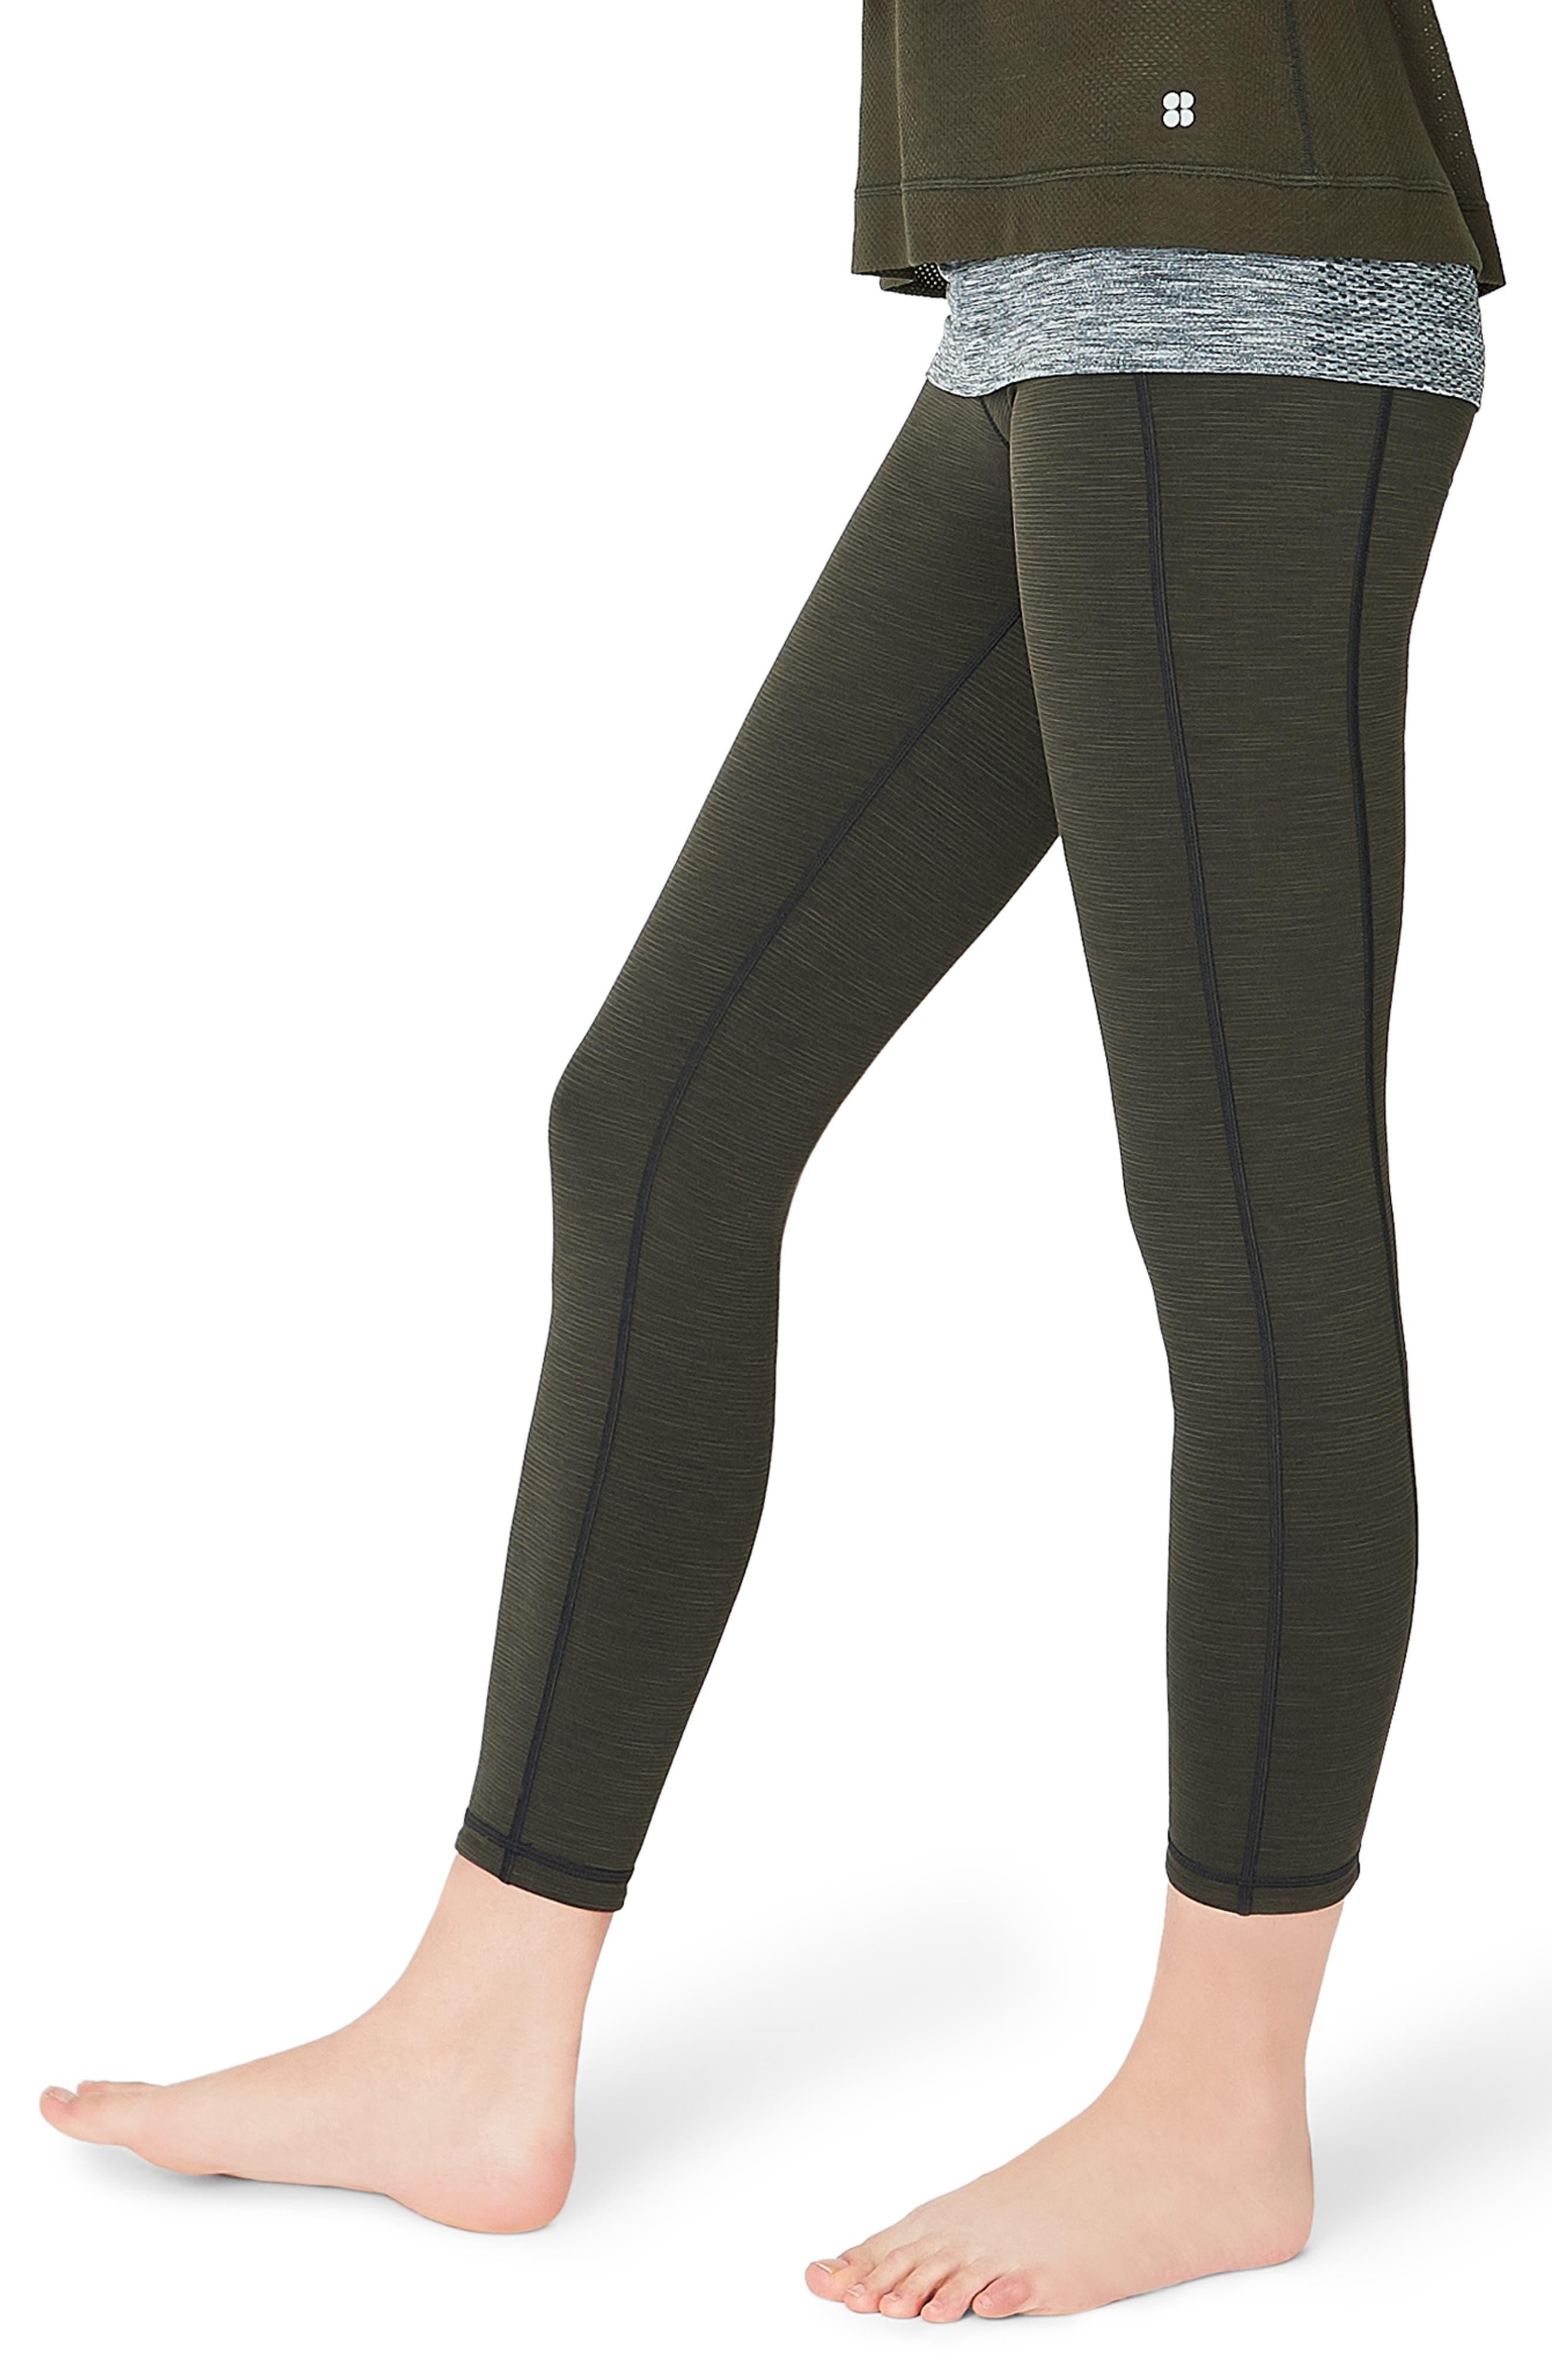 SWEATY BETTY, Reversible Yoga Leggings, Alternate thumbnail 4, color, 300